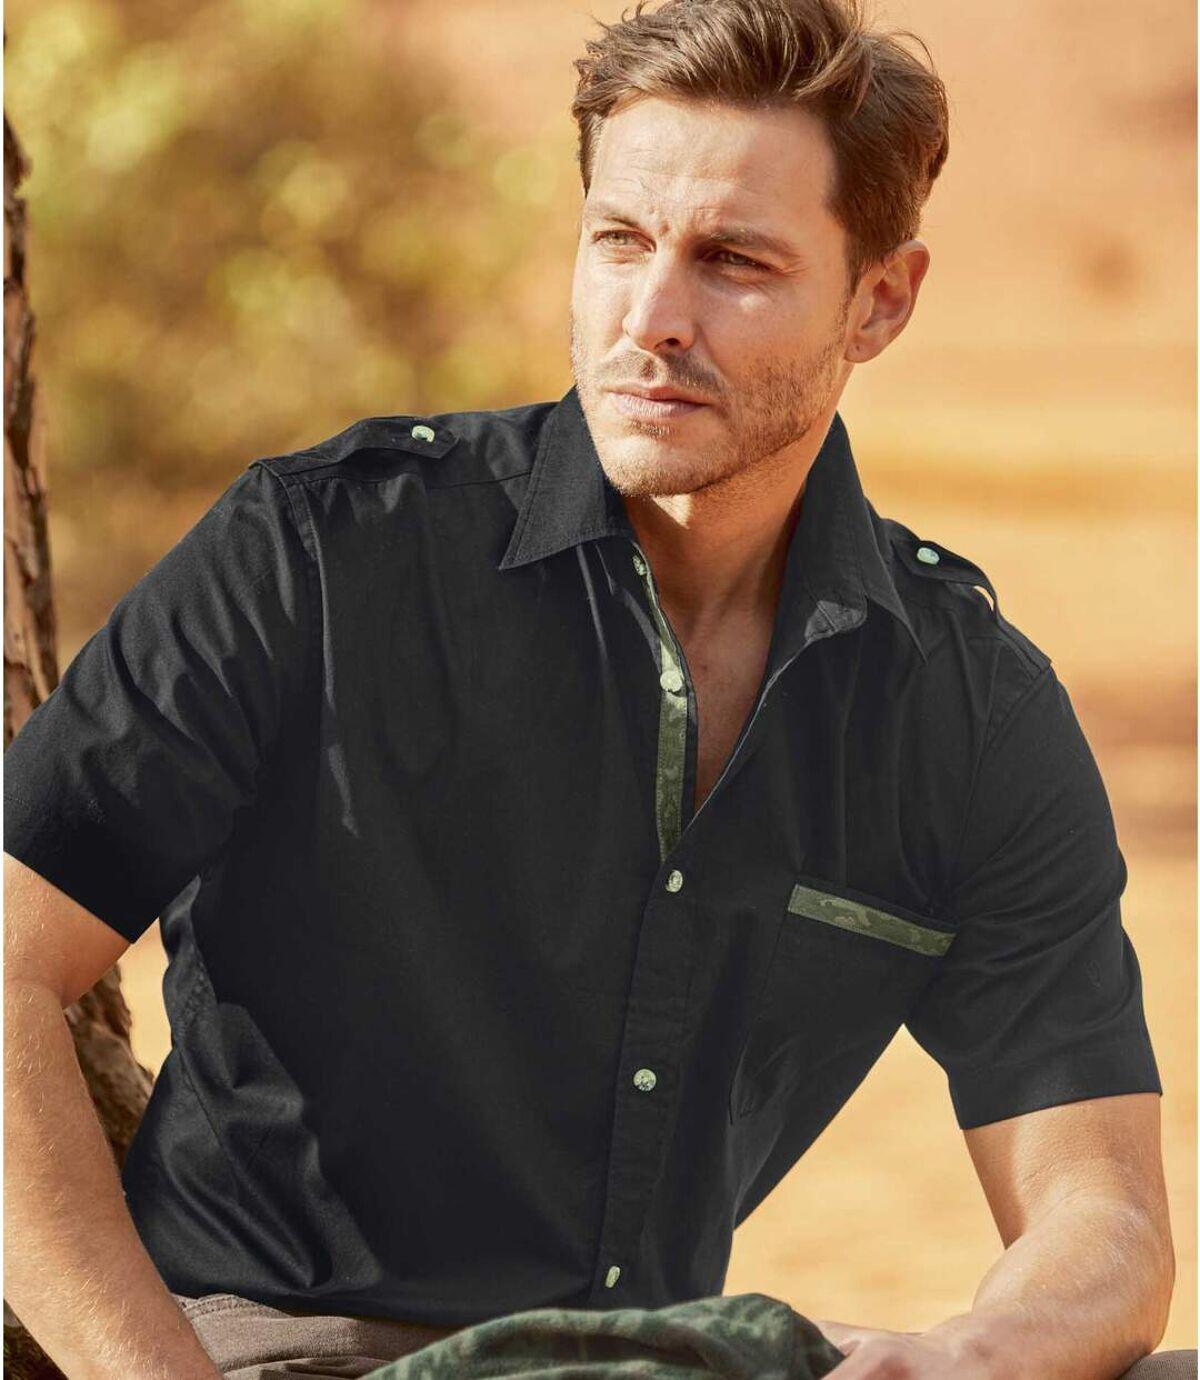 Men's Black Shirt with Camouflage Details Atlas For Men